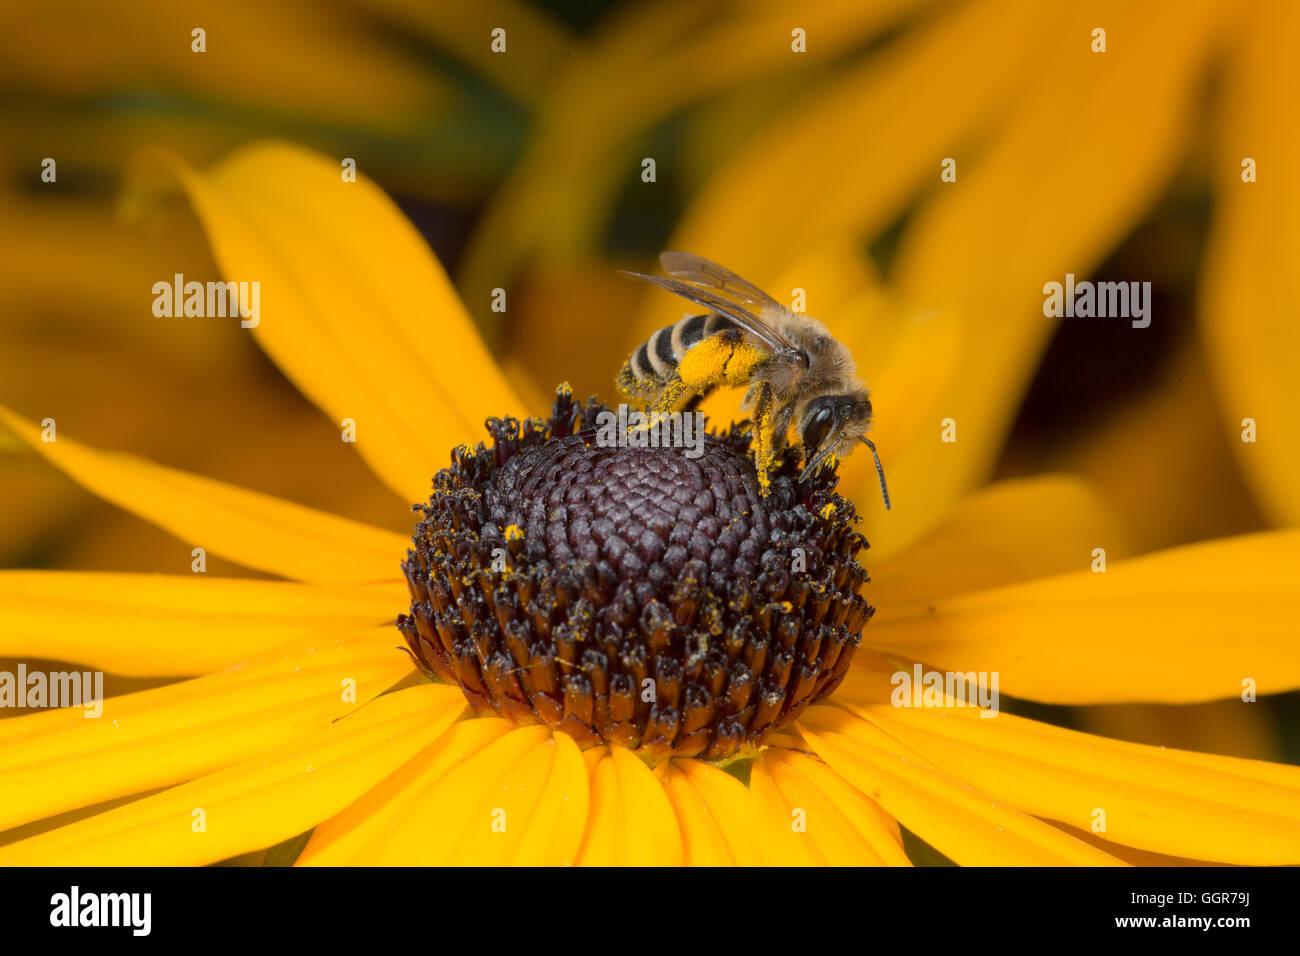 Bee sitting on yellow flower in macro view Stock Photo